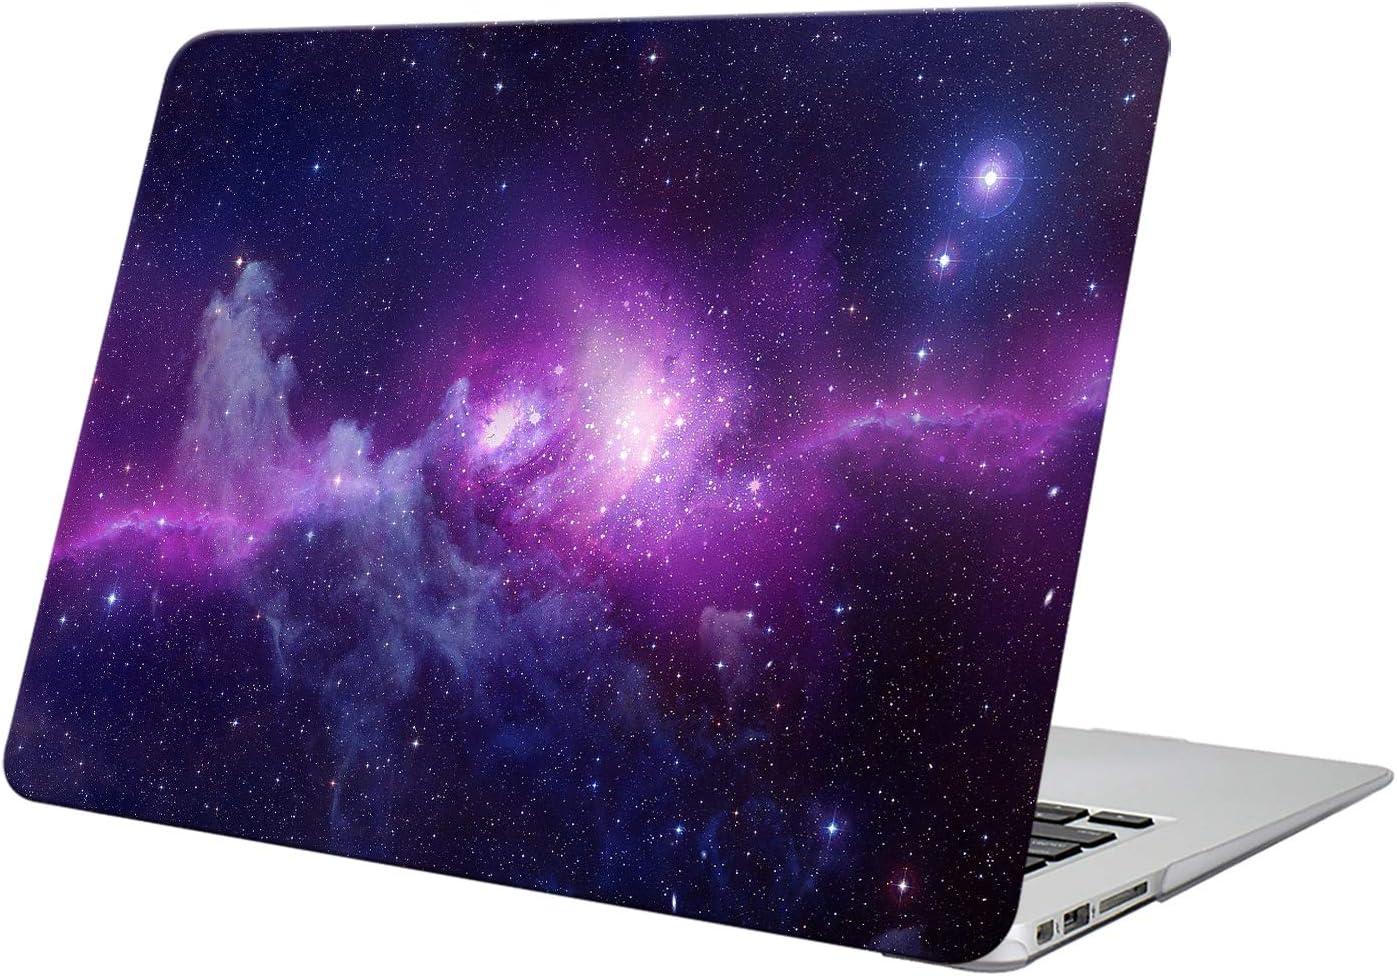 Funut Compatible with MacBook Pro 13 Inch Case A1278, Rubberized Hard PC Shell Case Scratch-Free Protective Cover for 2015 MacBook Pro 13.3 Inch Model A1278 Non-Retina, Purple Nebula